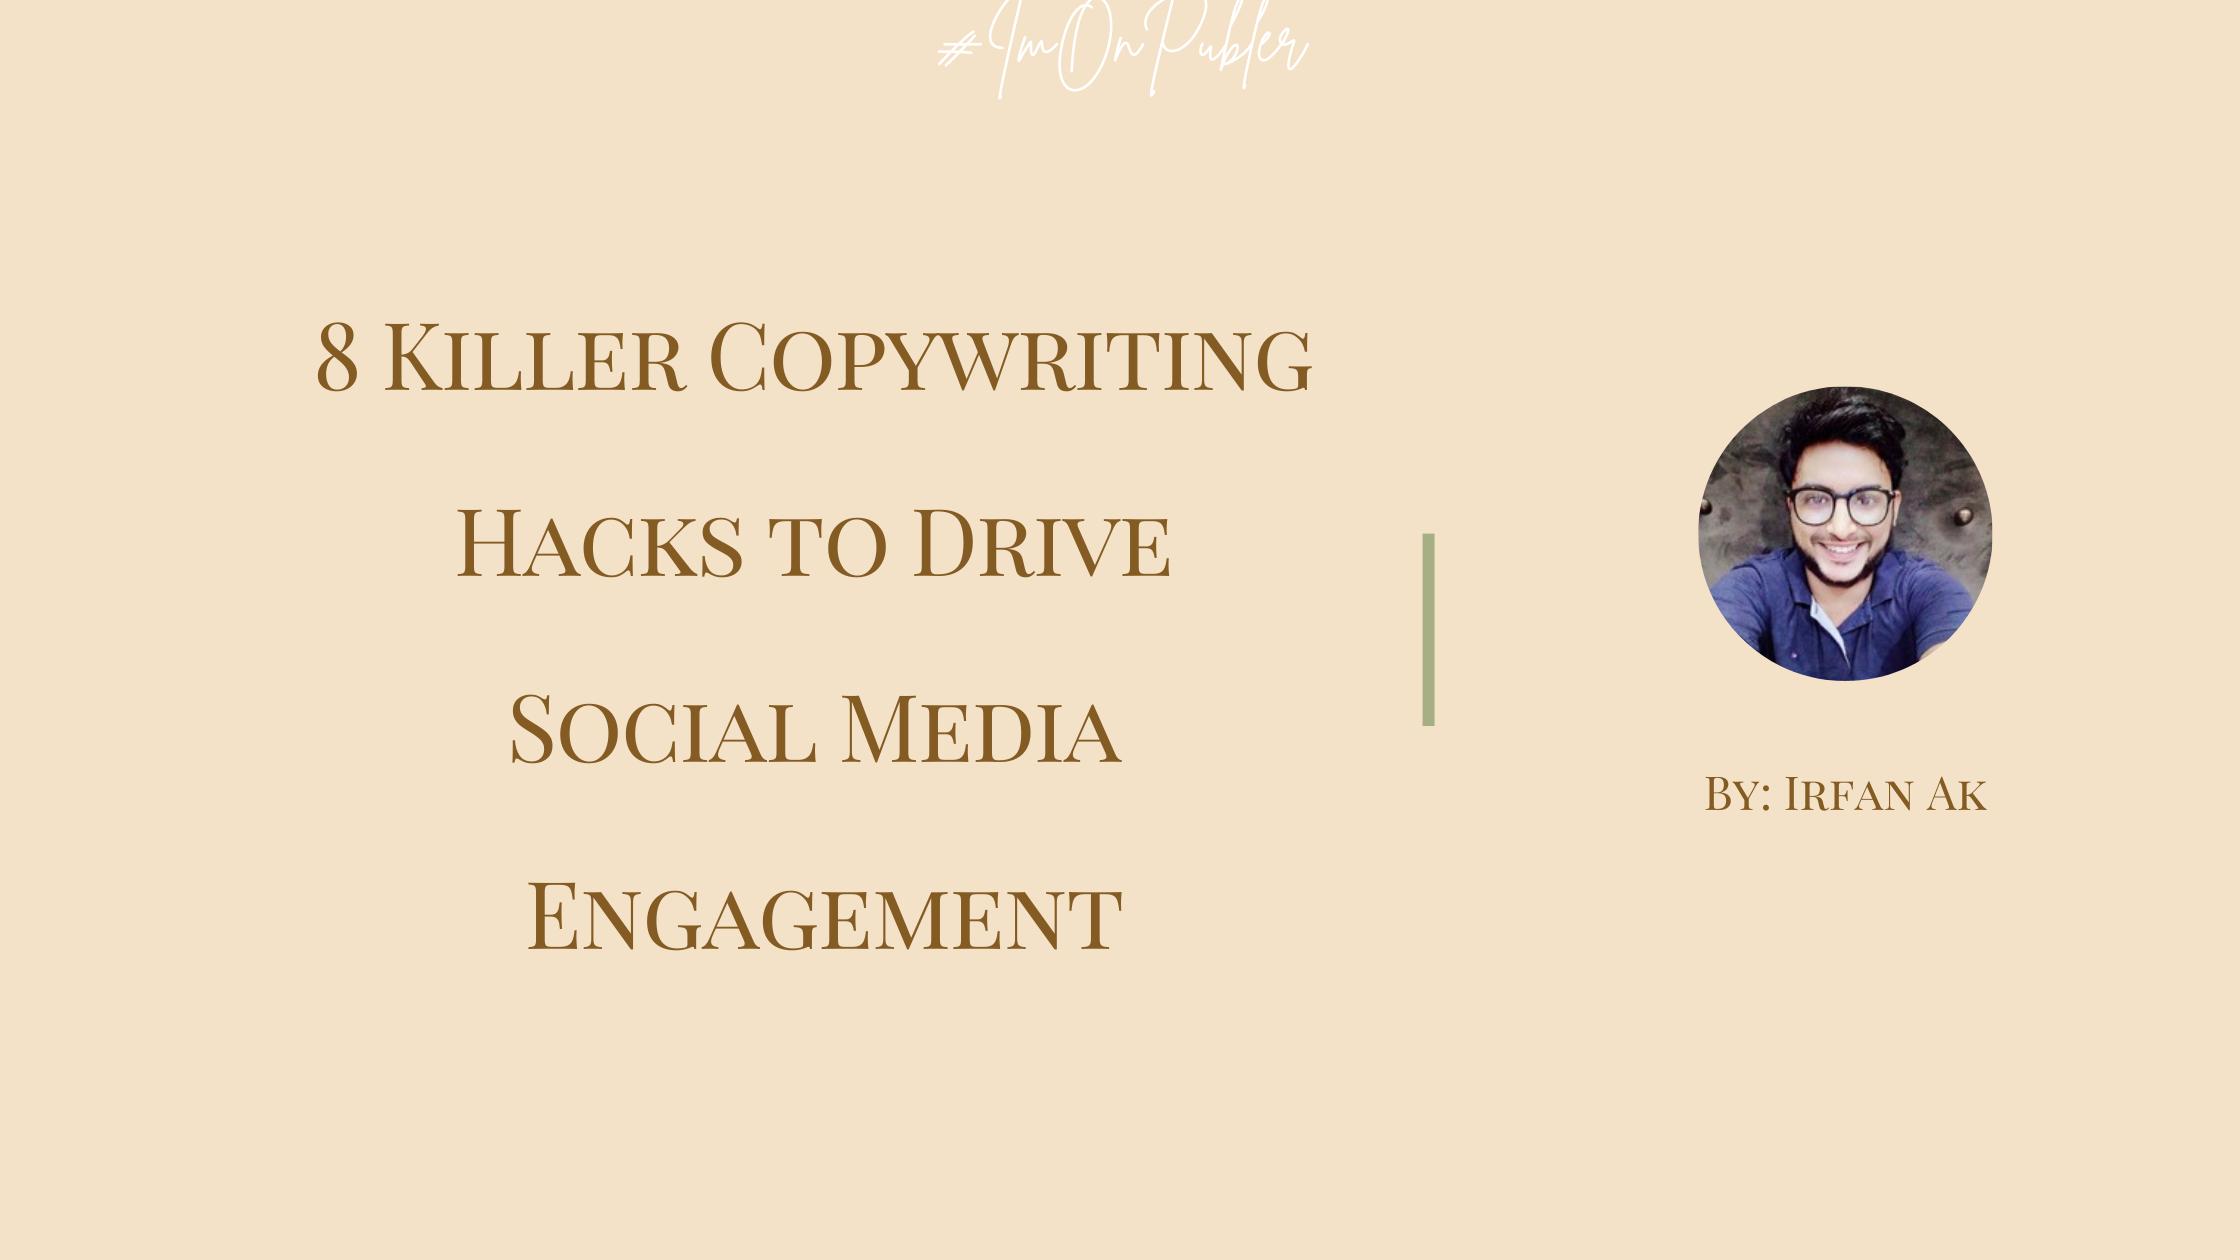 8 Killer Copywriting Hacks to Drive Social Media Engagement by Irfan